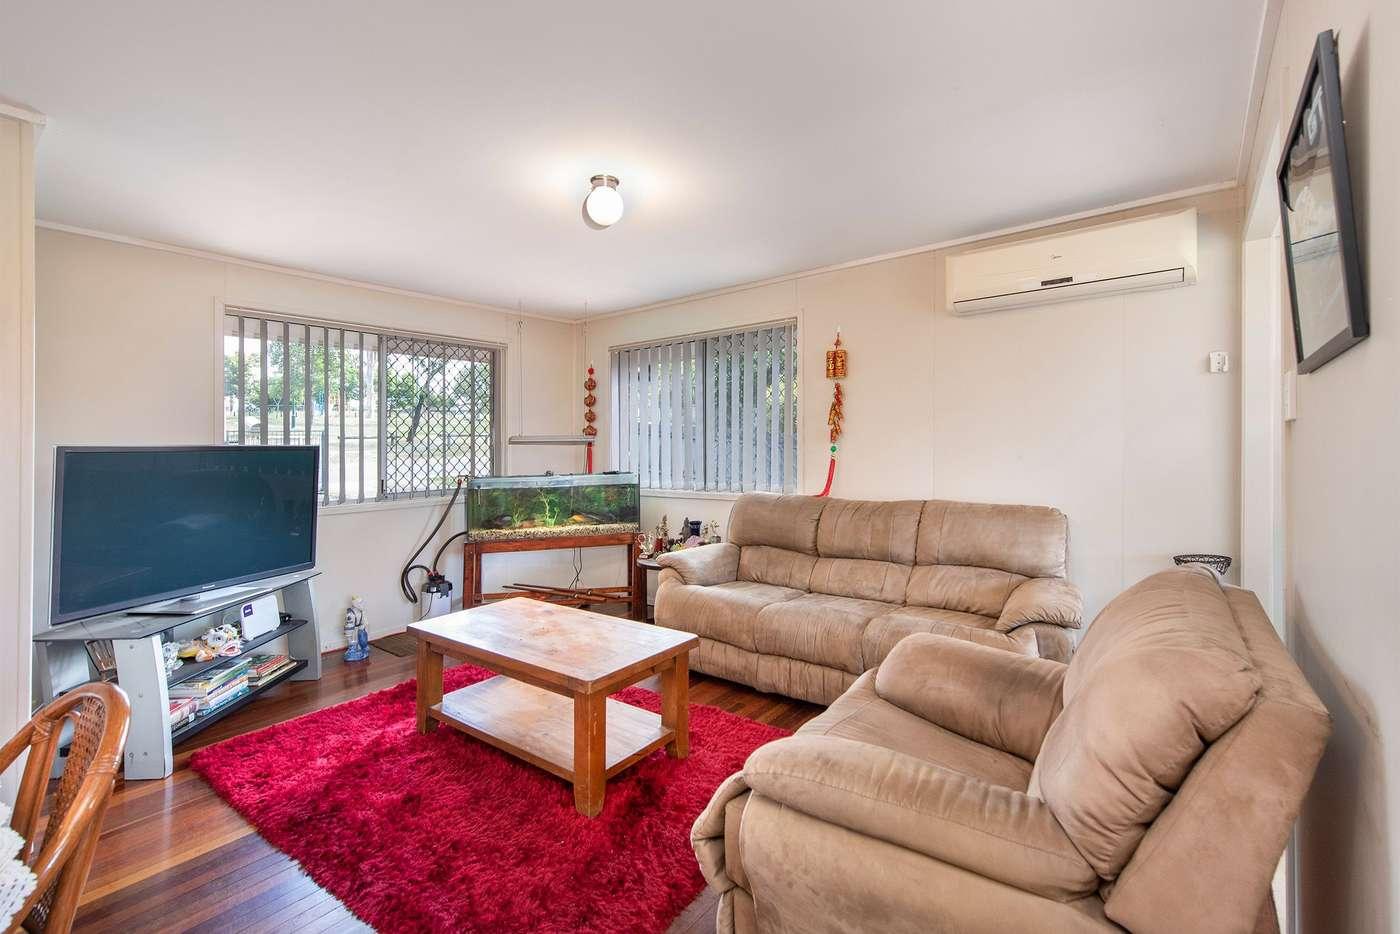 Sixth view of Homely house listing, 17 Bramston Street, Woodridge QLD 4114